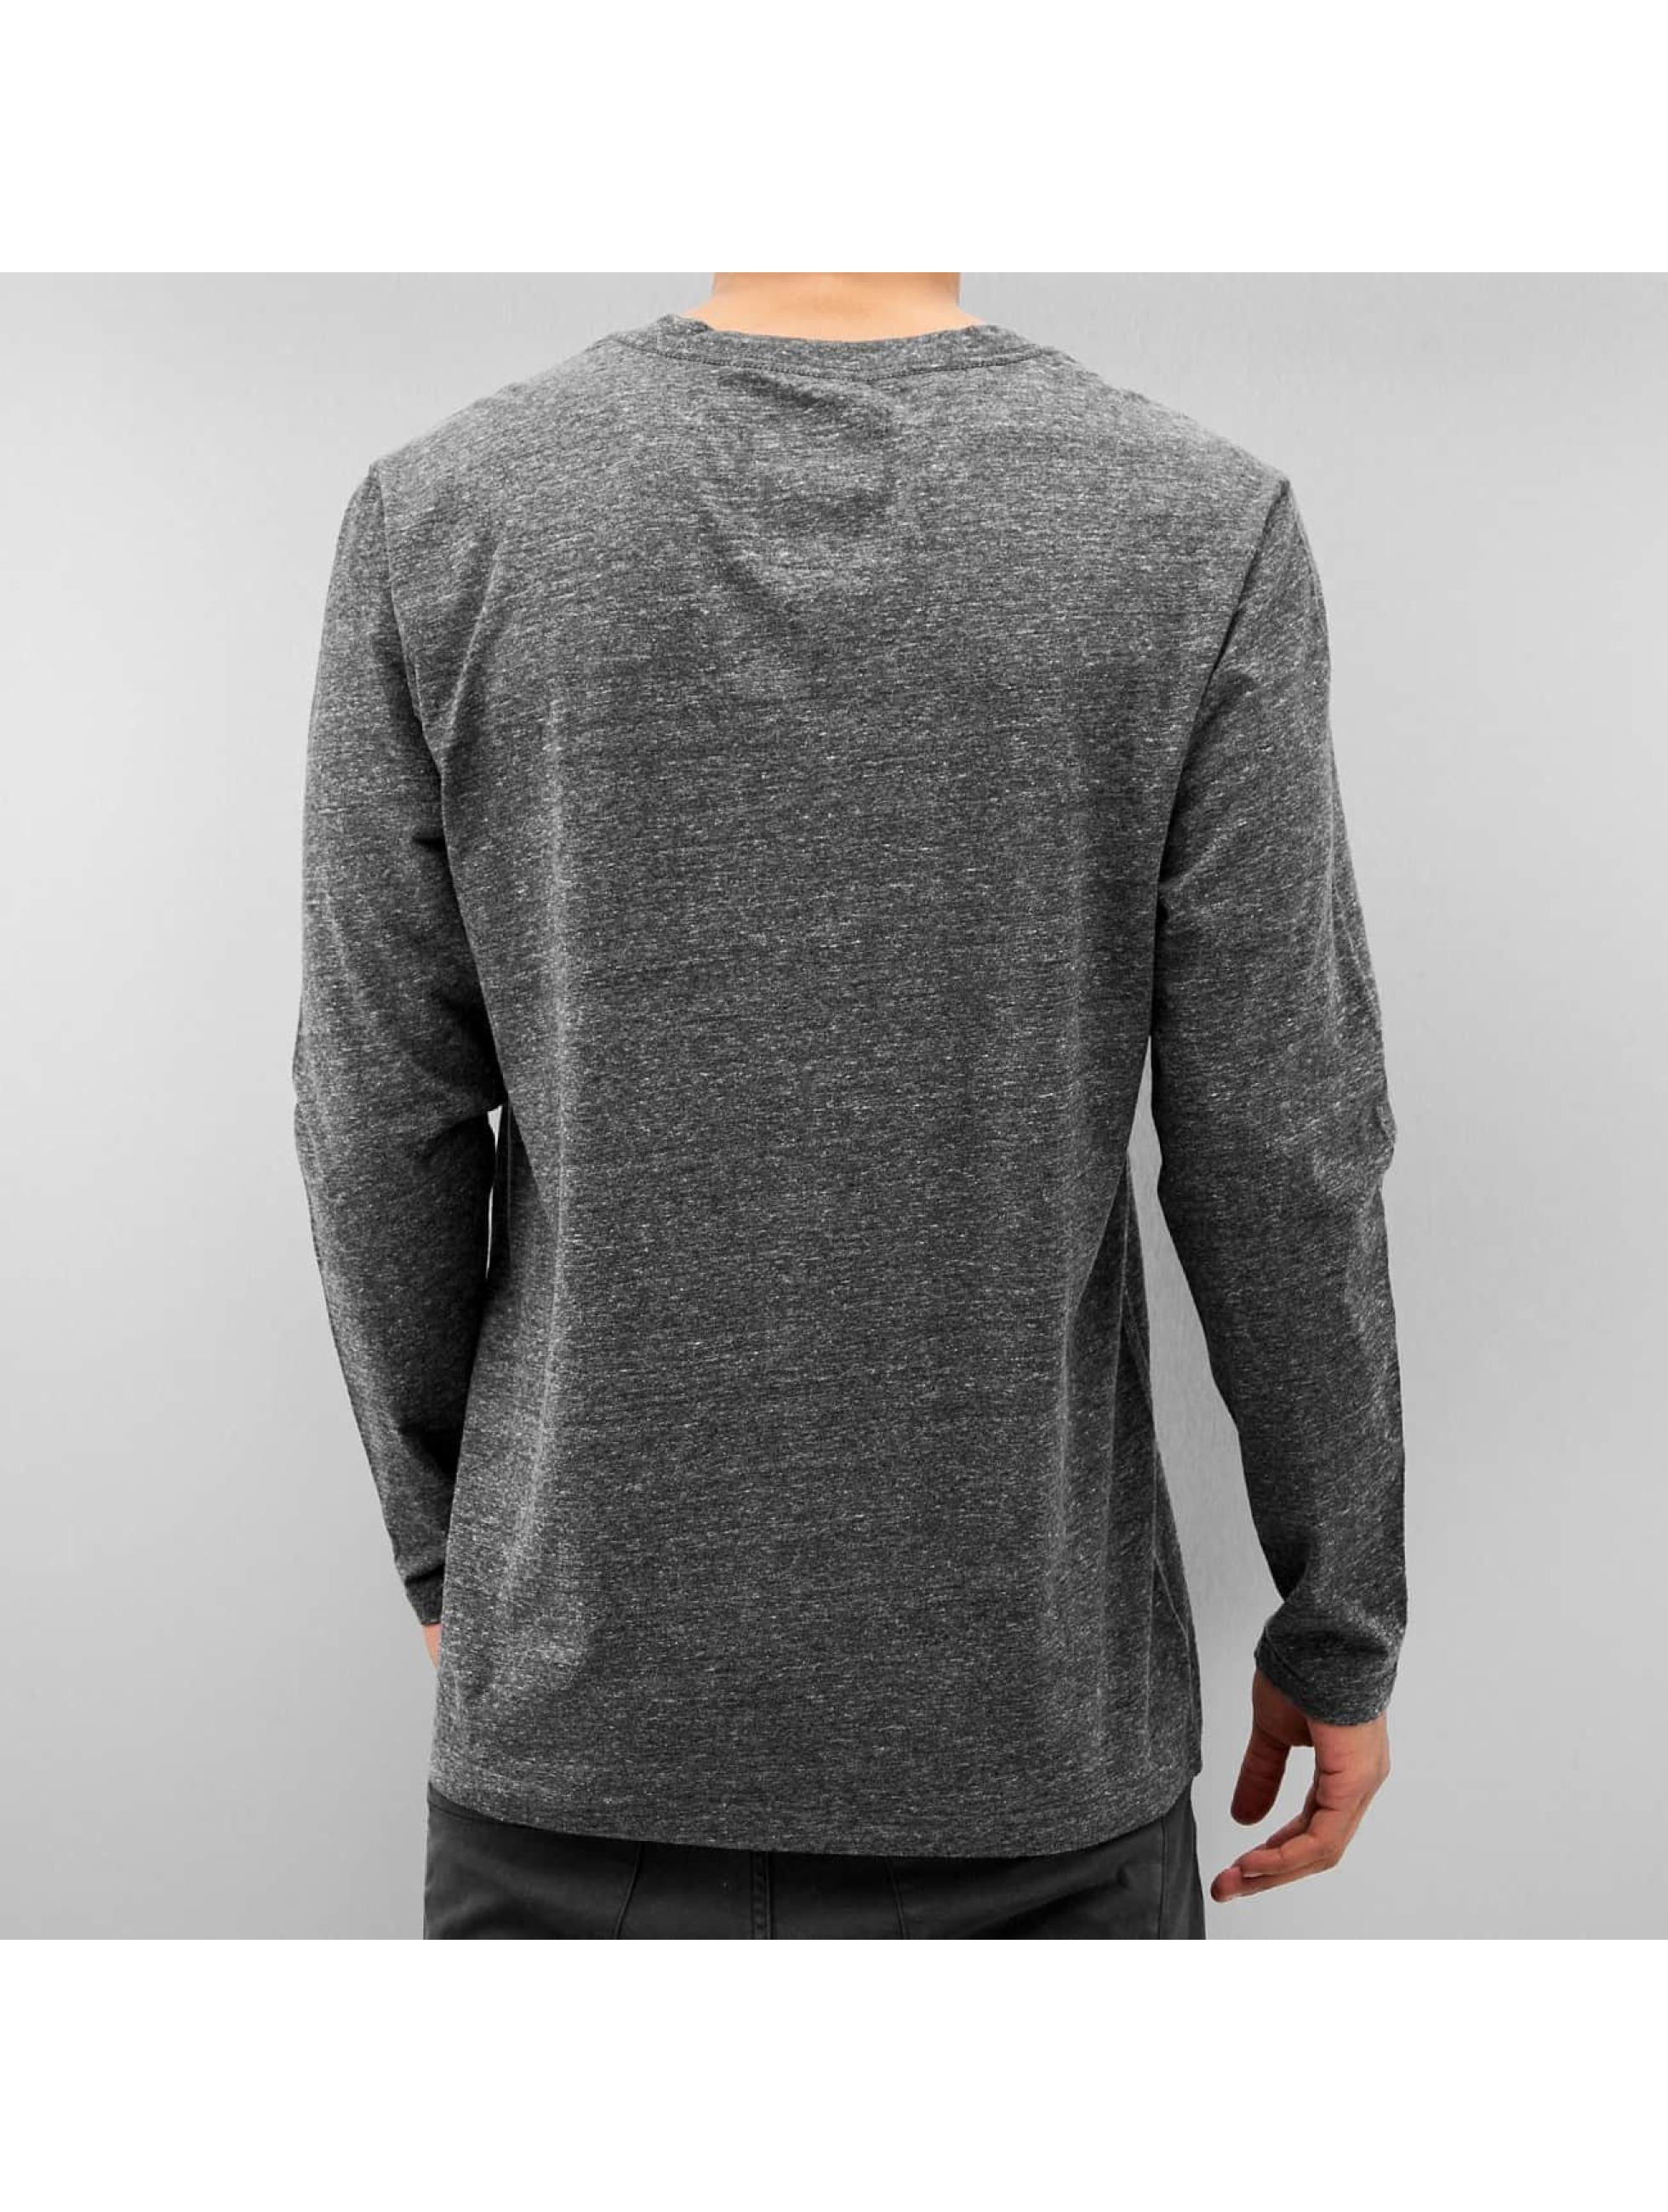 G-Star Водолазка Riban Pocket Premium Compact Jersey серый